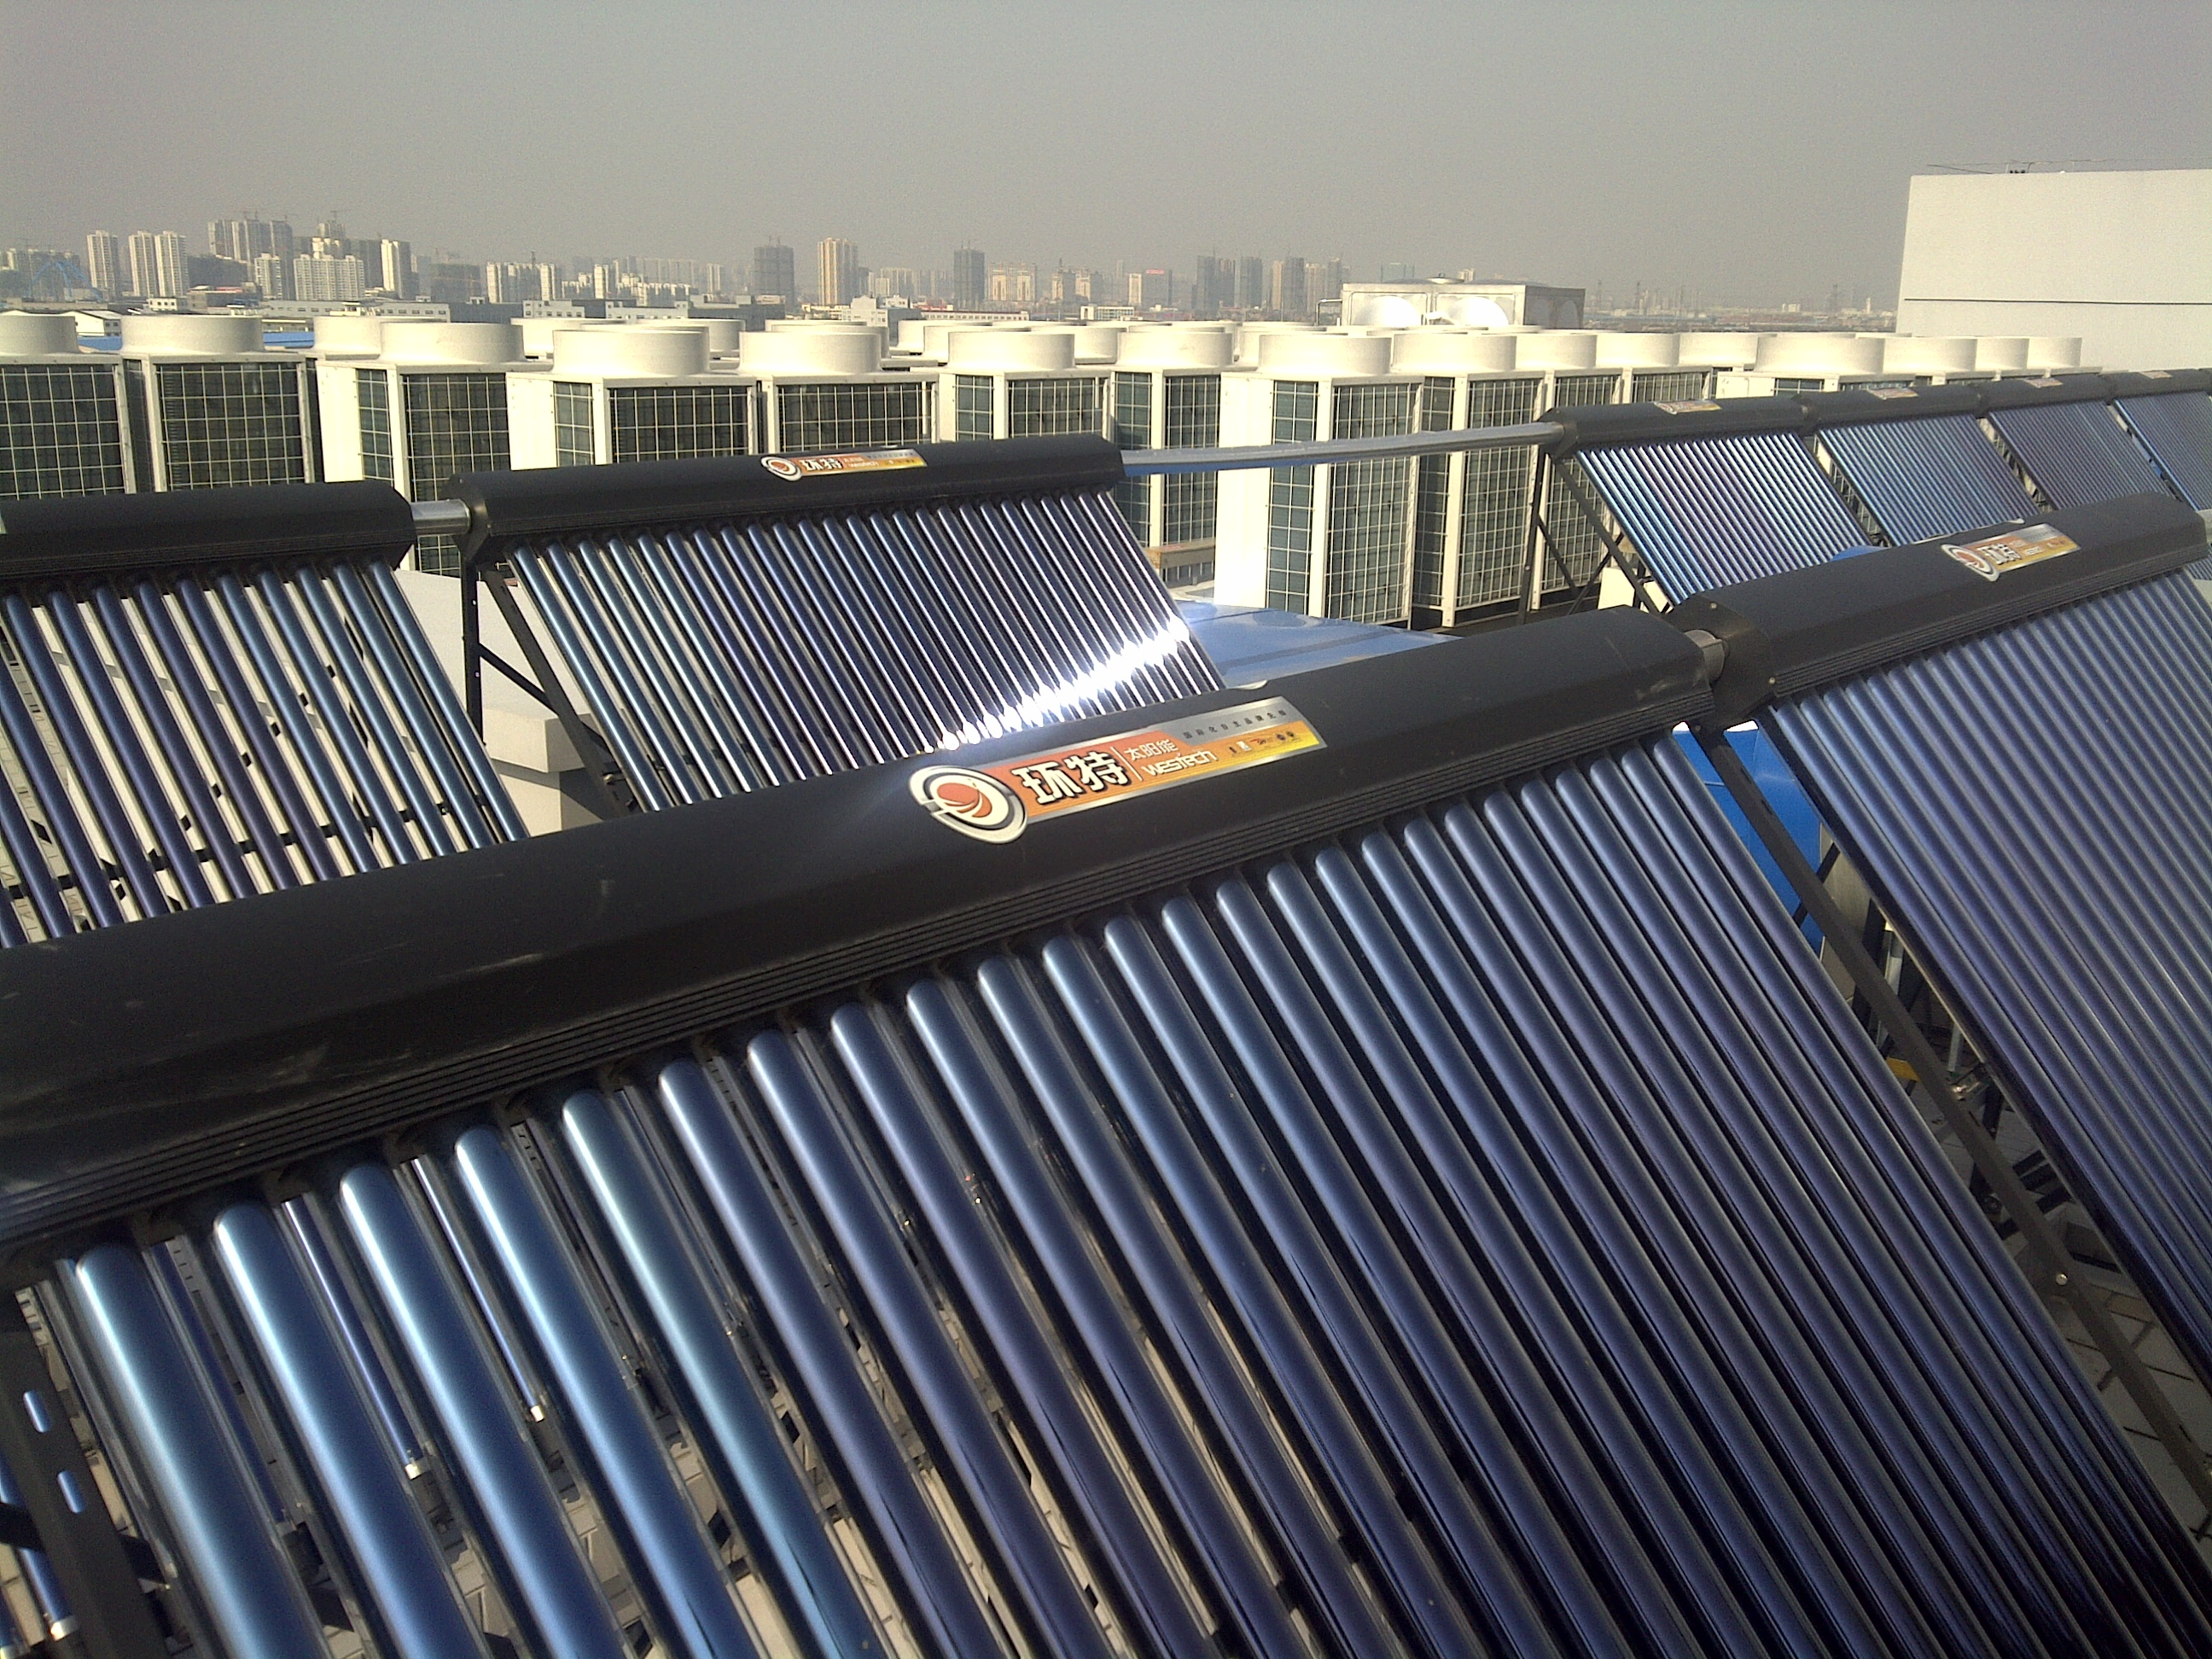 2013-03-29-images-SolarwaterheatingWuxiHospital.jpg